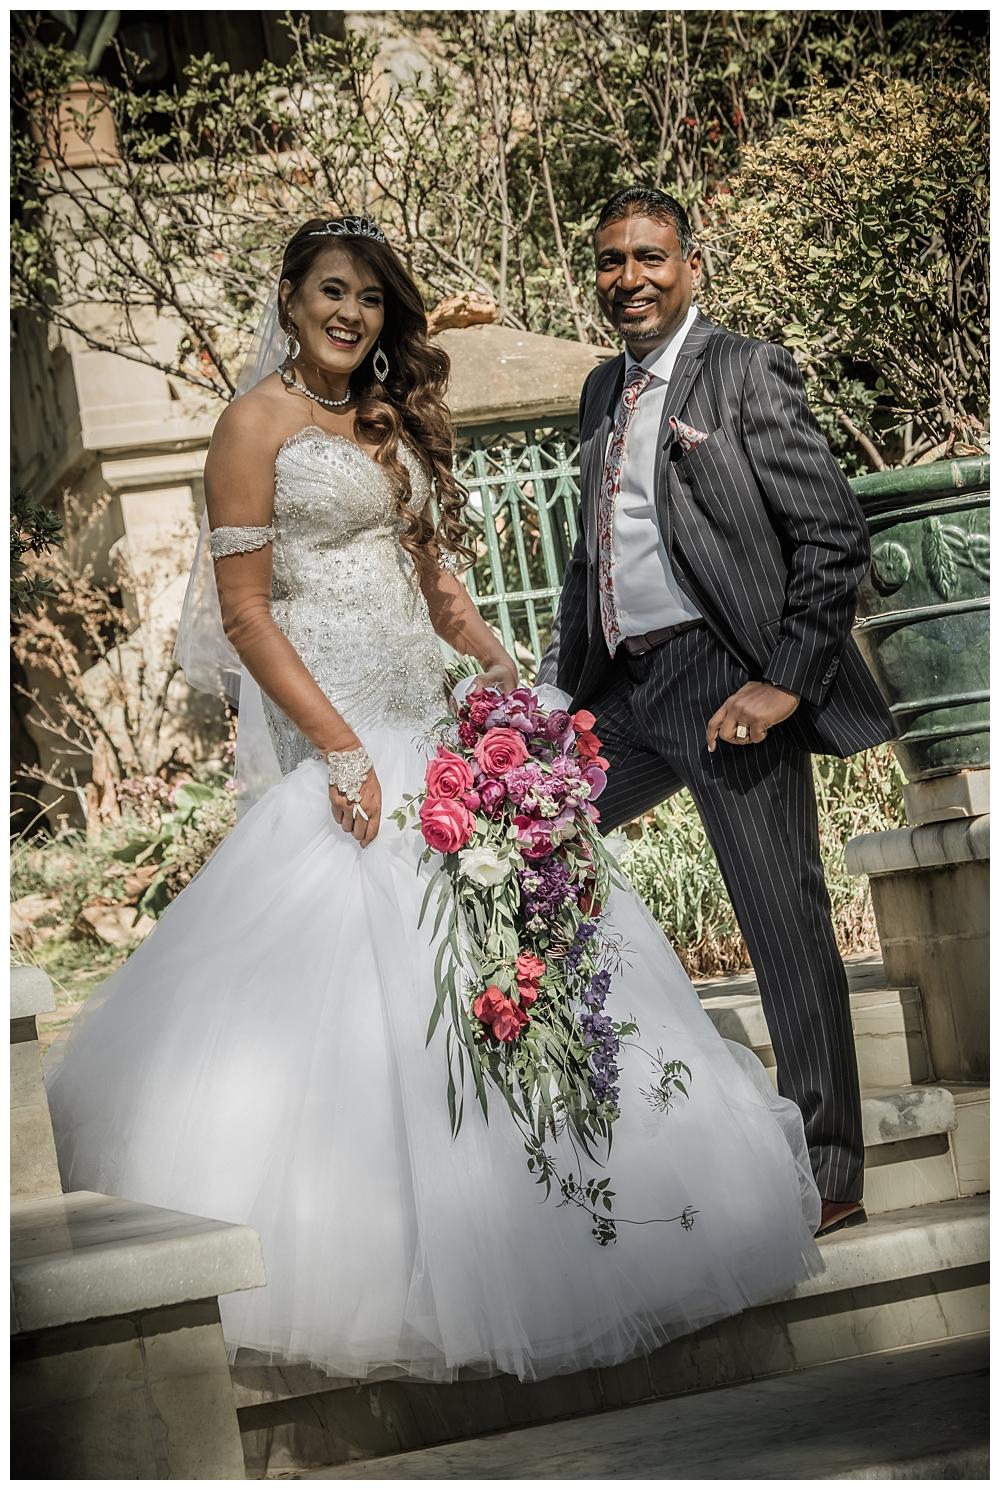 Best_Wedding_Photographer_AlexanderSmith_1866.jpg